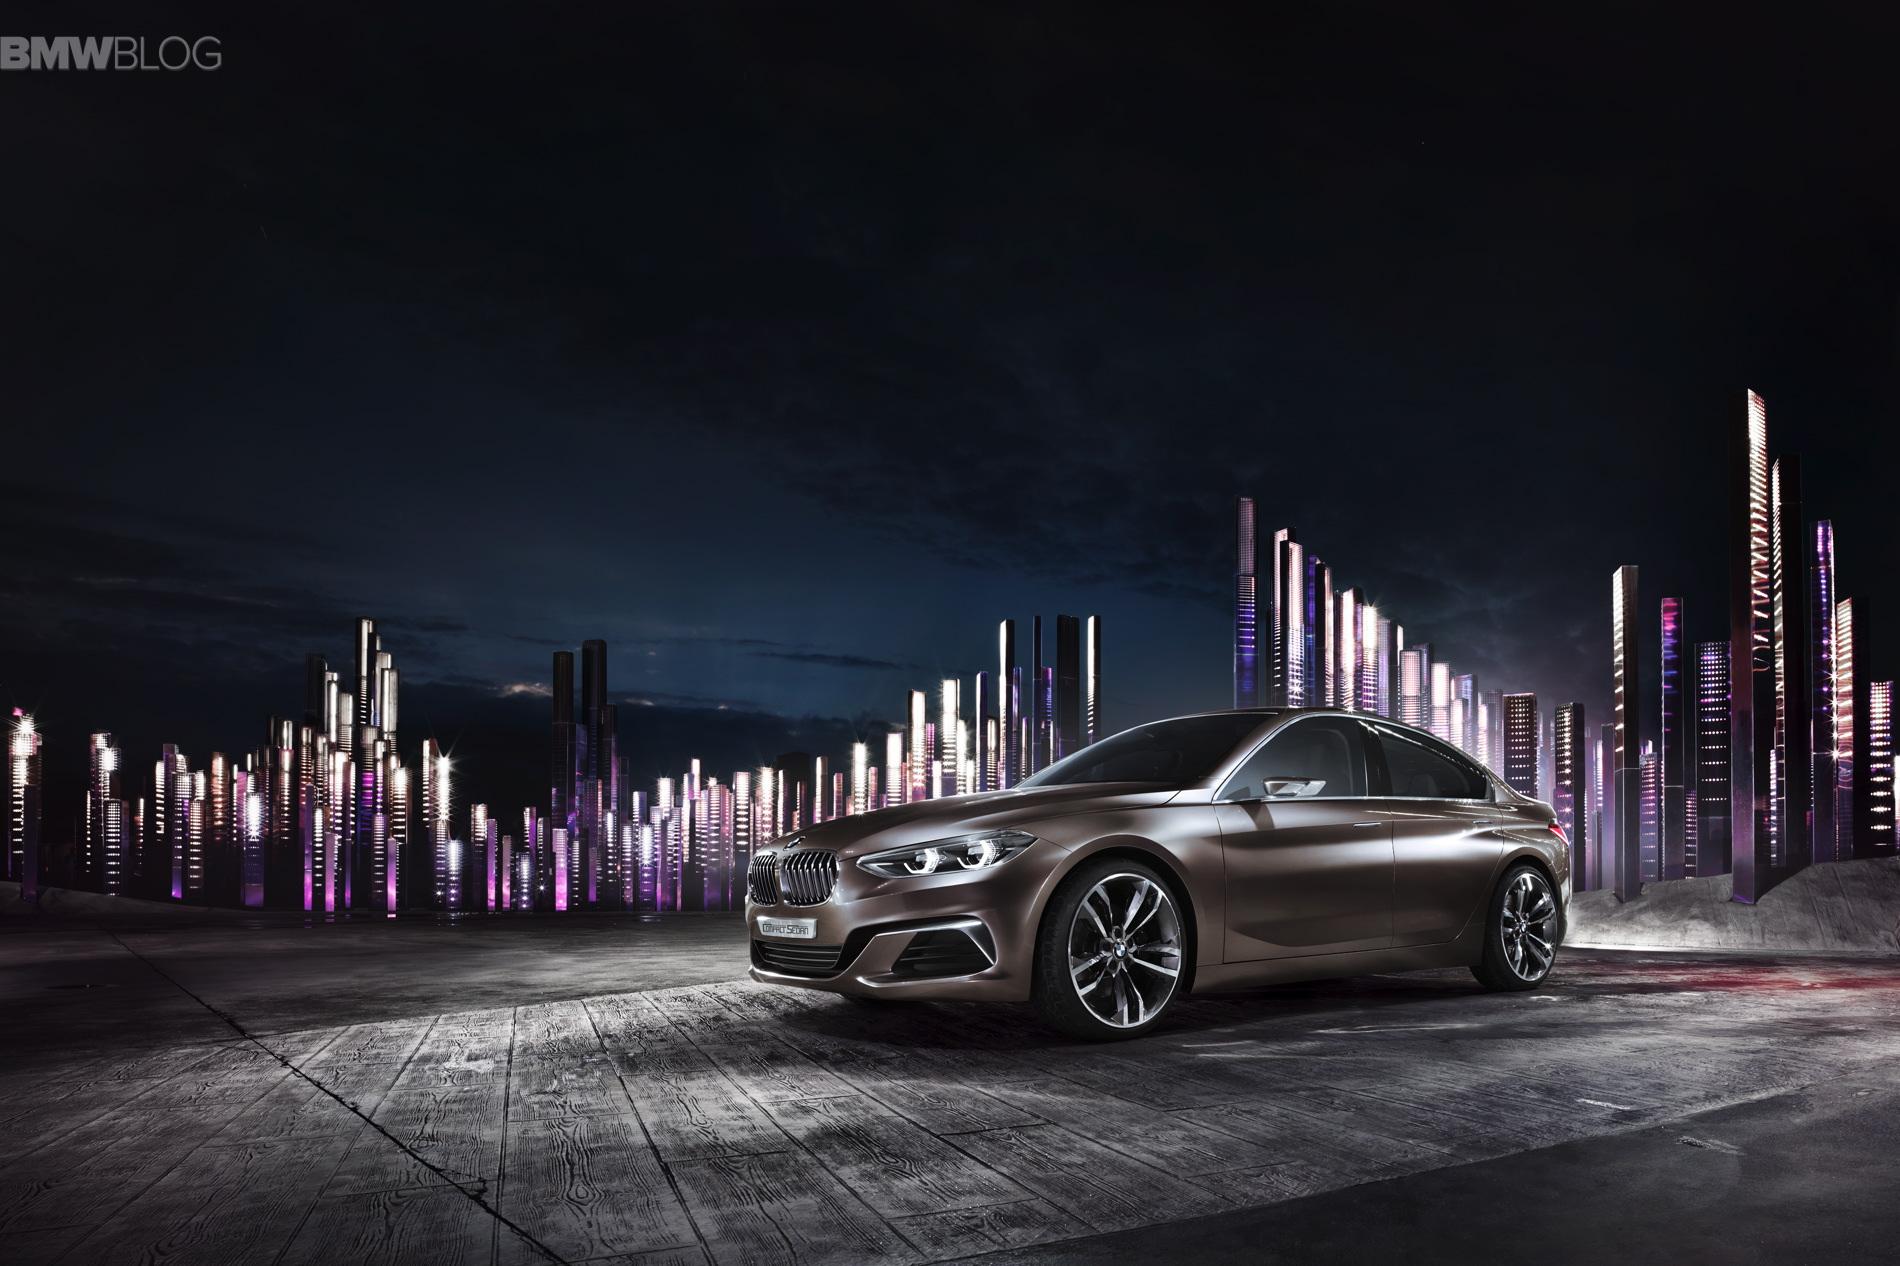 BMW Concept Compact Sedan images 5